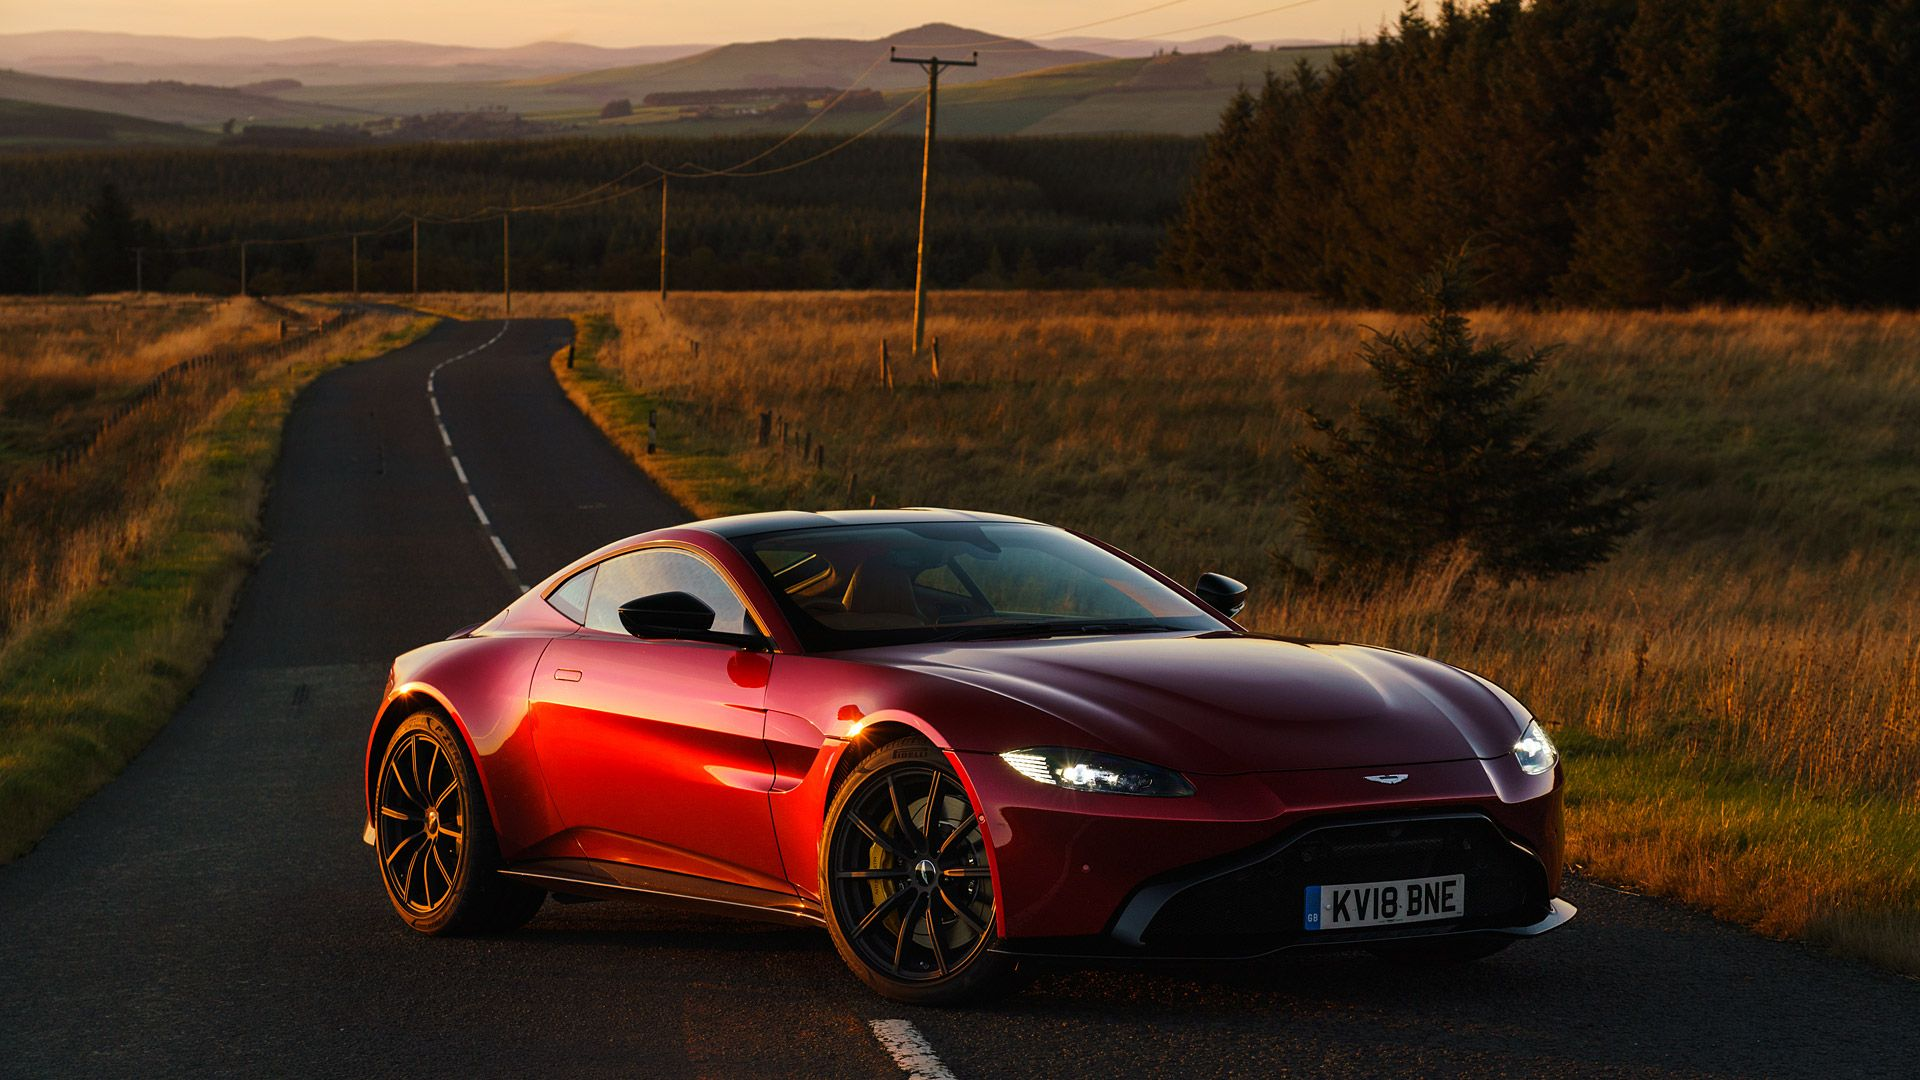 Fondos De Pantalla De Aston Martin Fondosmil